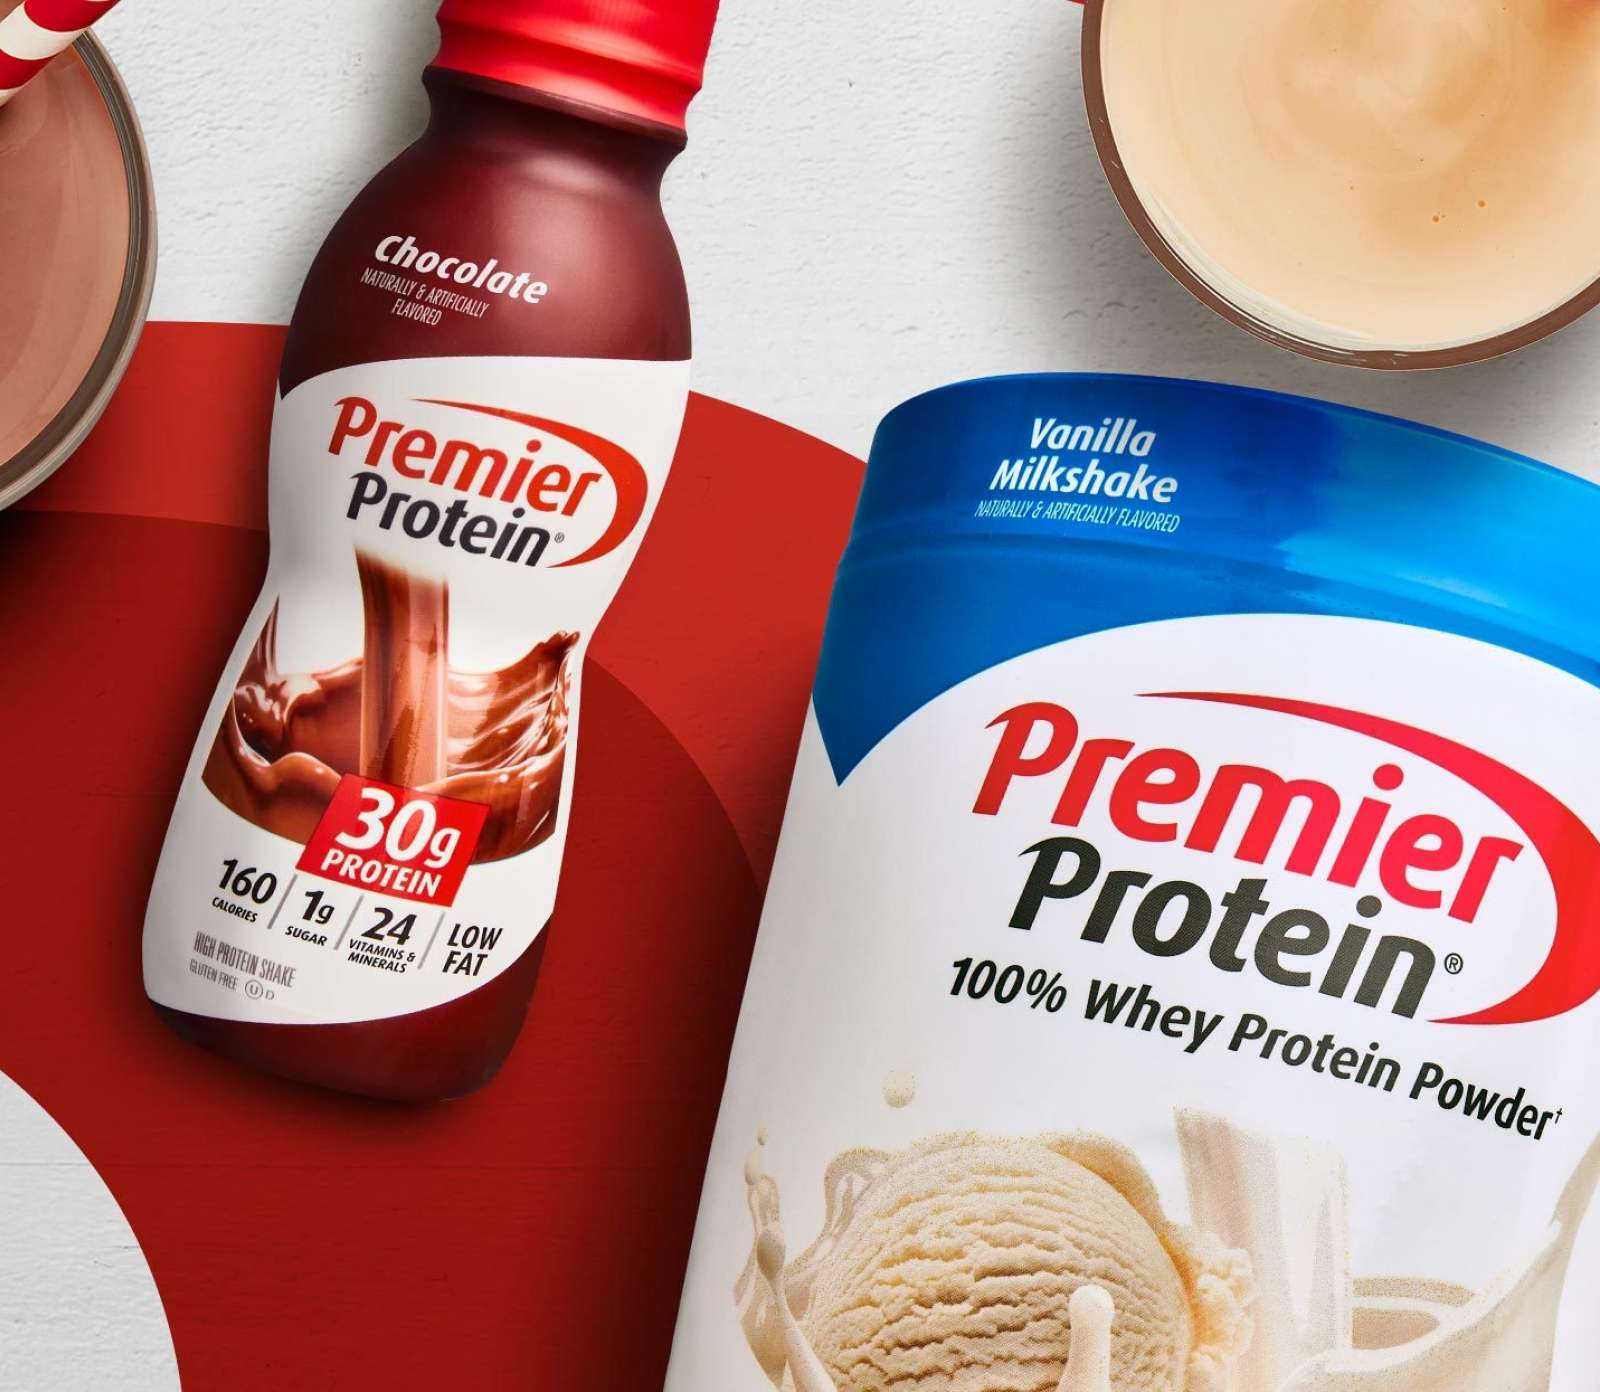 A Premier Protein shake next to Premier Protein Powder.